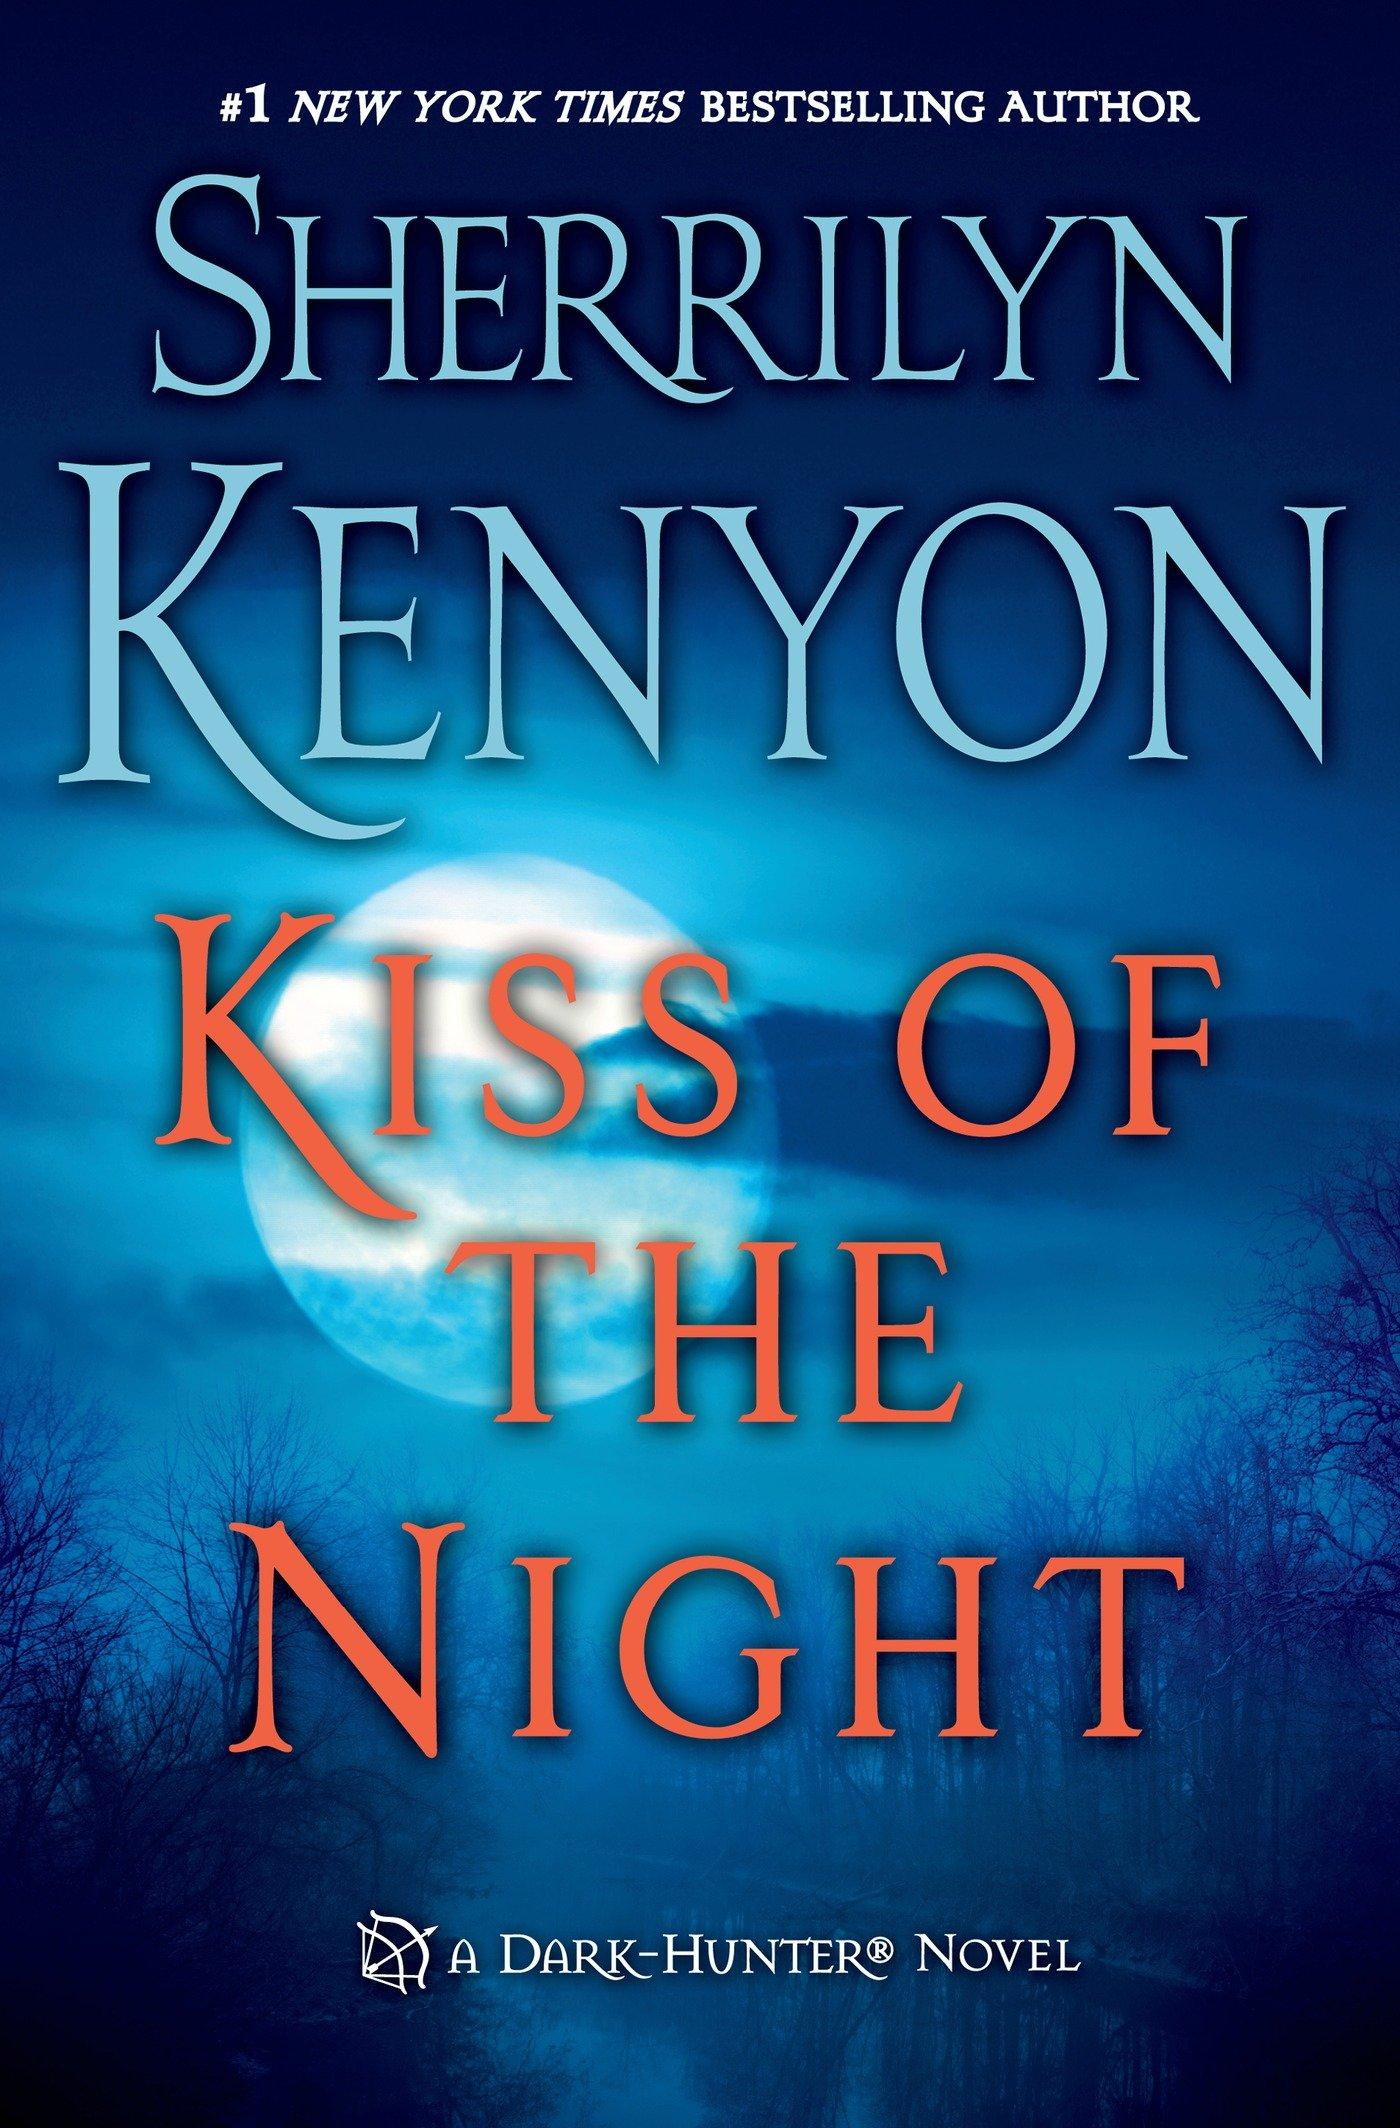 Kiss of the Night (Dark-Hunter Novels) by St. Martin's Press